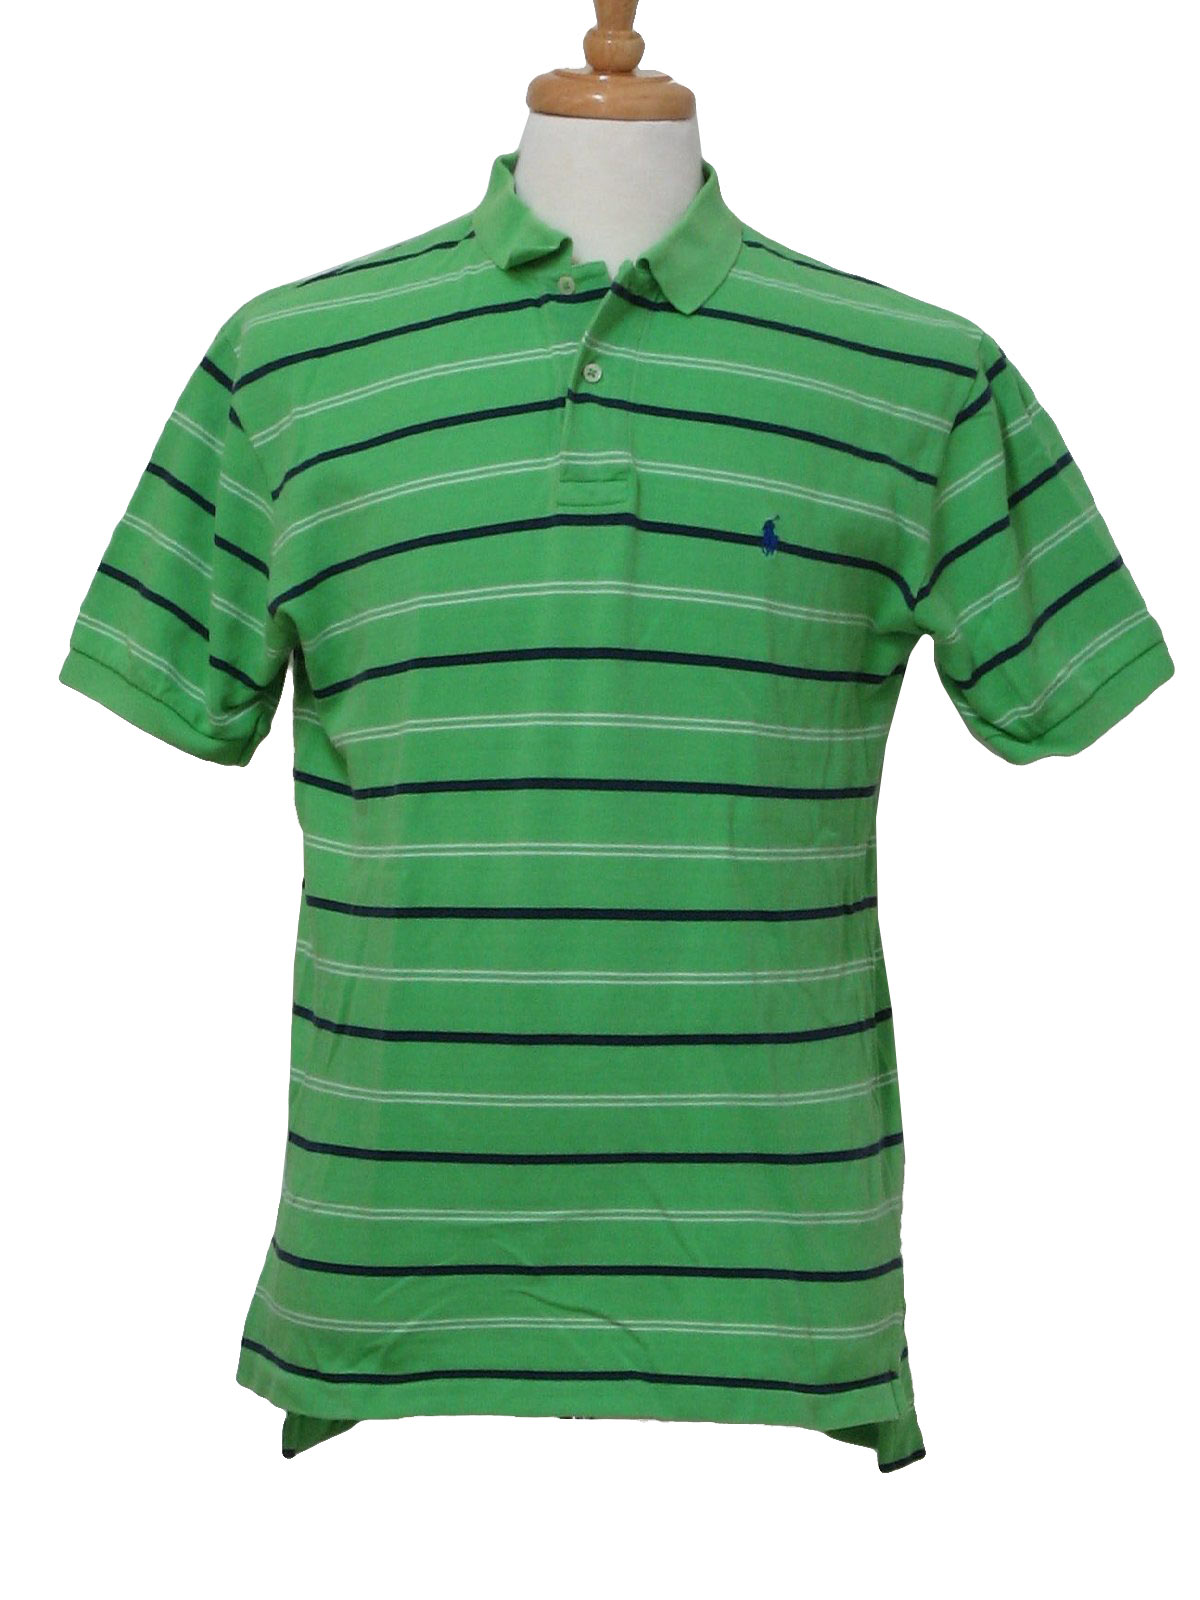 d07edb05 Shirt: (made more recently) -Polo made in Bolivia- Mens green, blue ...